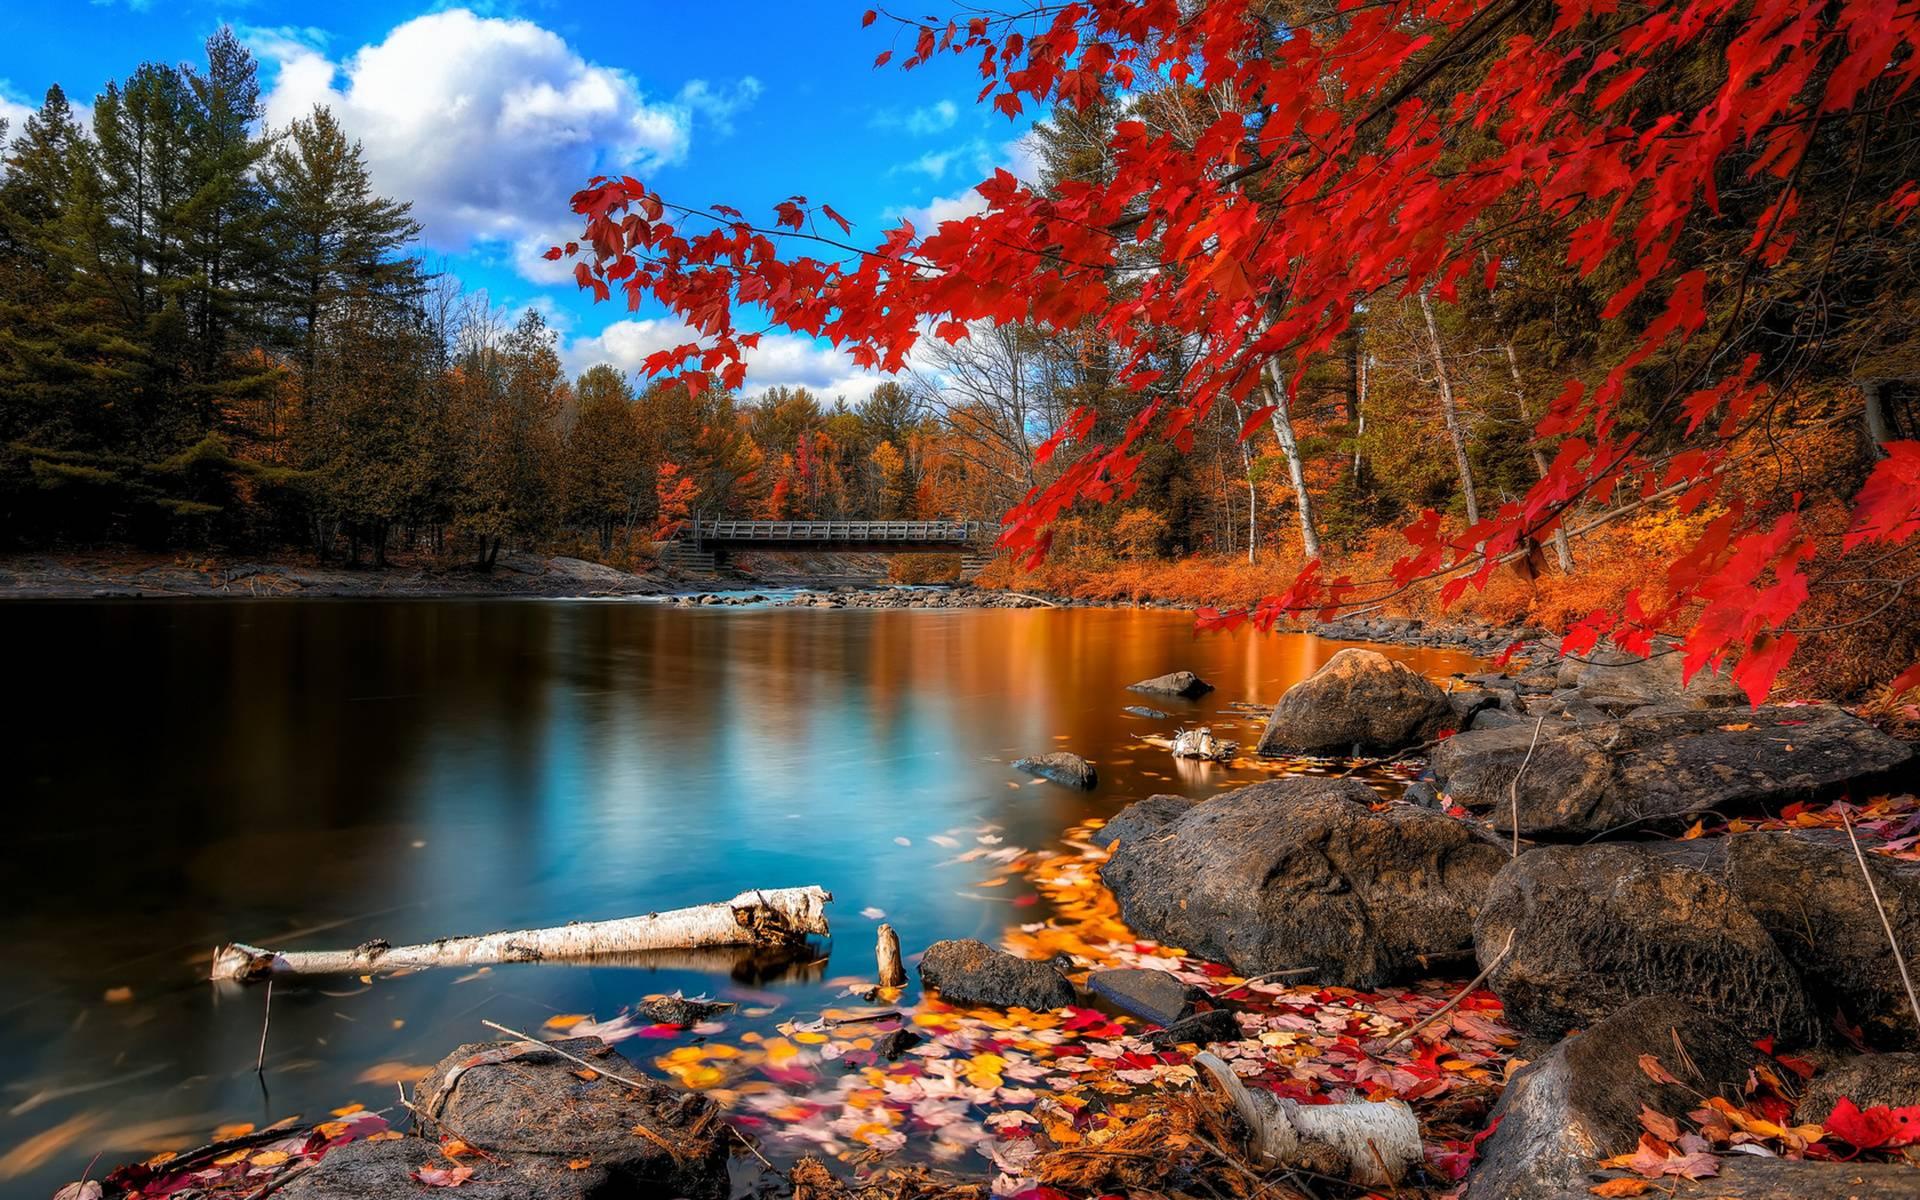 fall themed desktop backgrounds 011